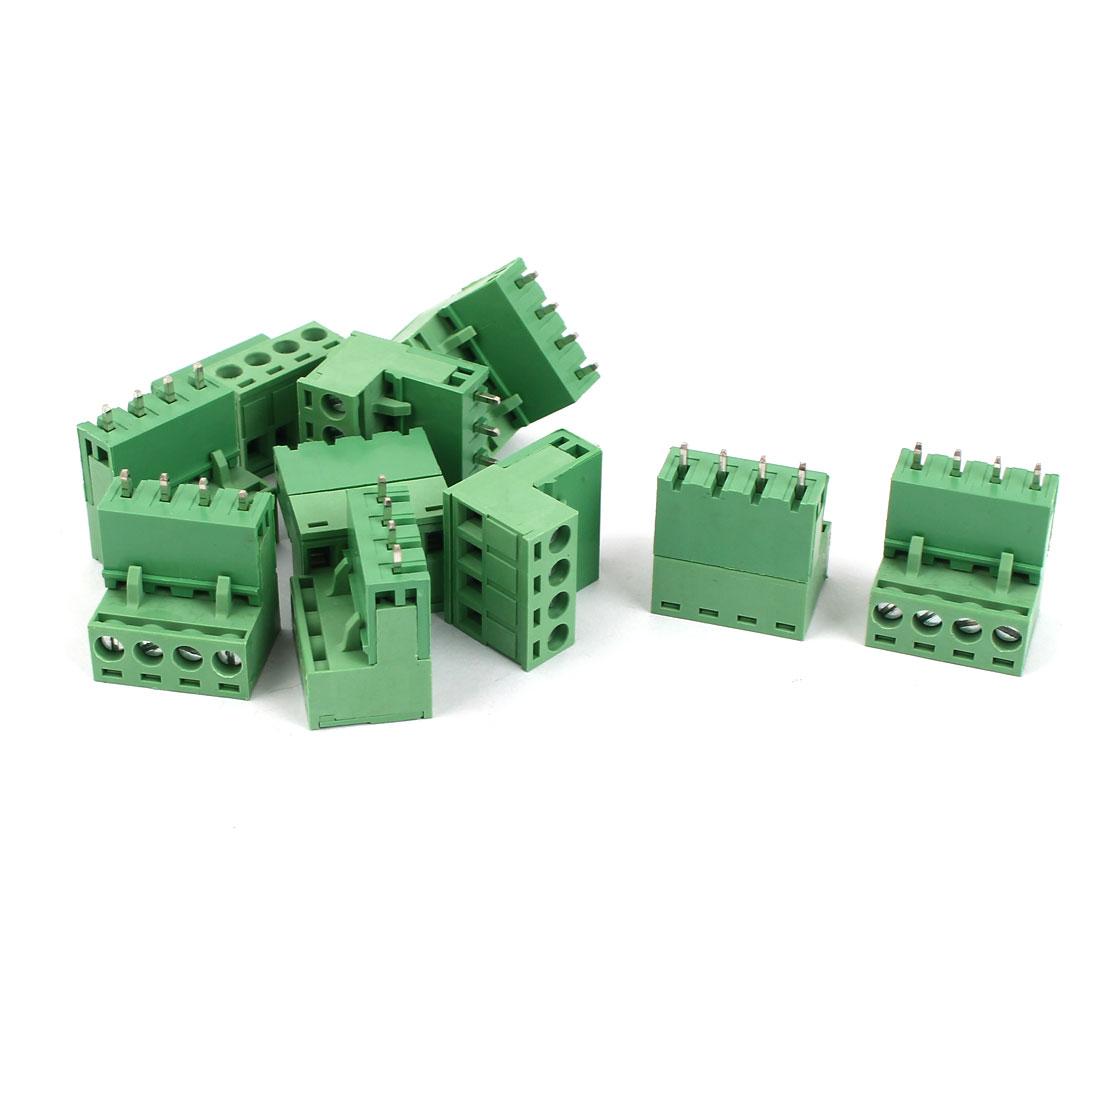 10 Pcs AC 300V 10A 4 Pins PCB Terminal Block Connector 5mm Pitch Green